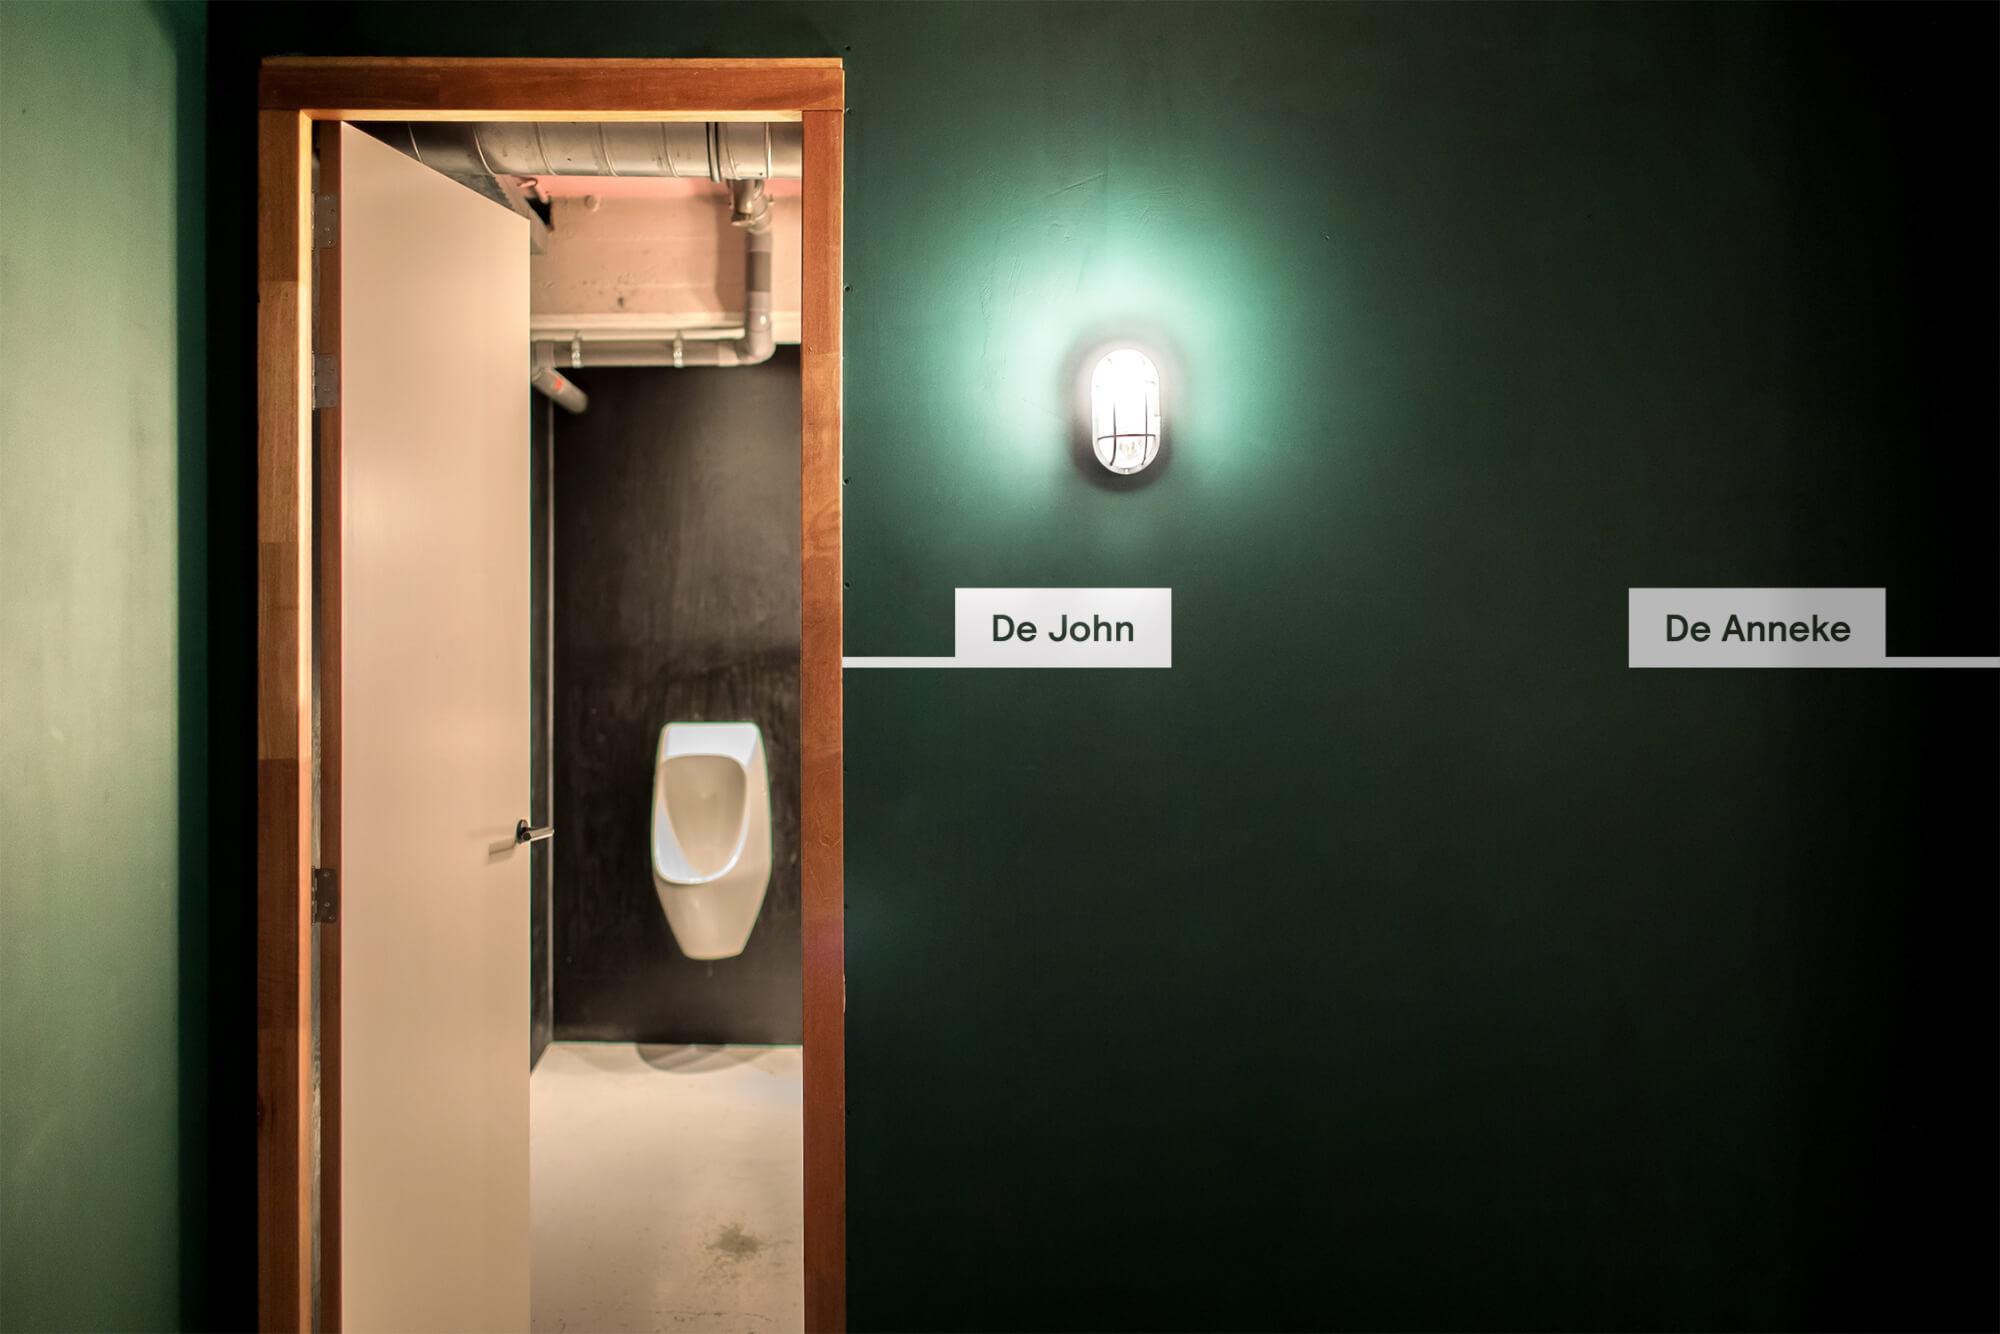 kapowski_bleyenberg_indoor-sign_5